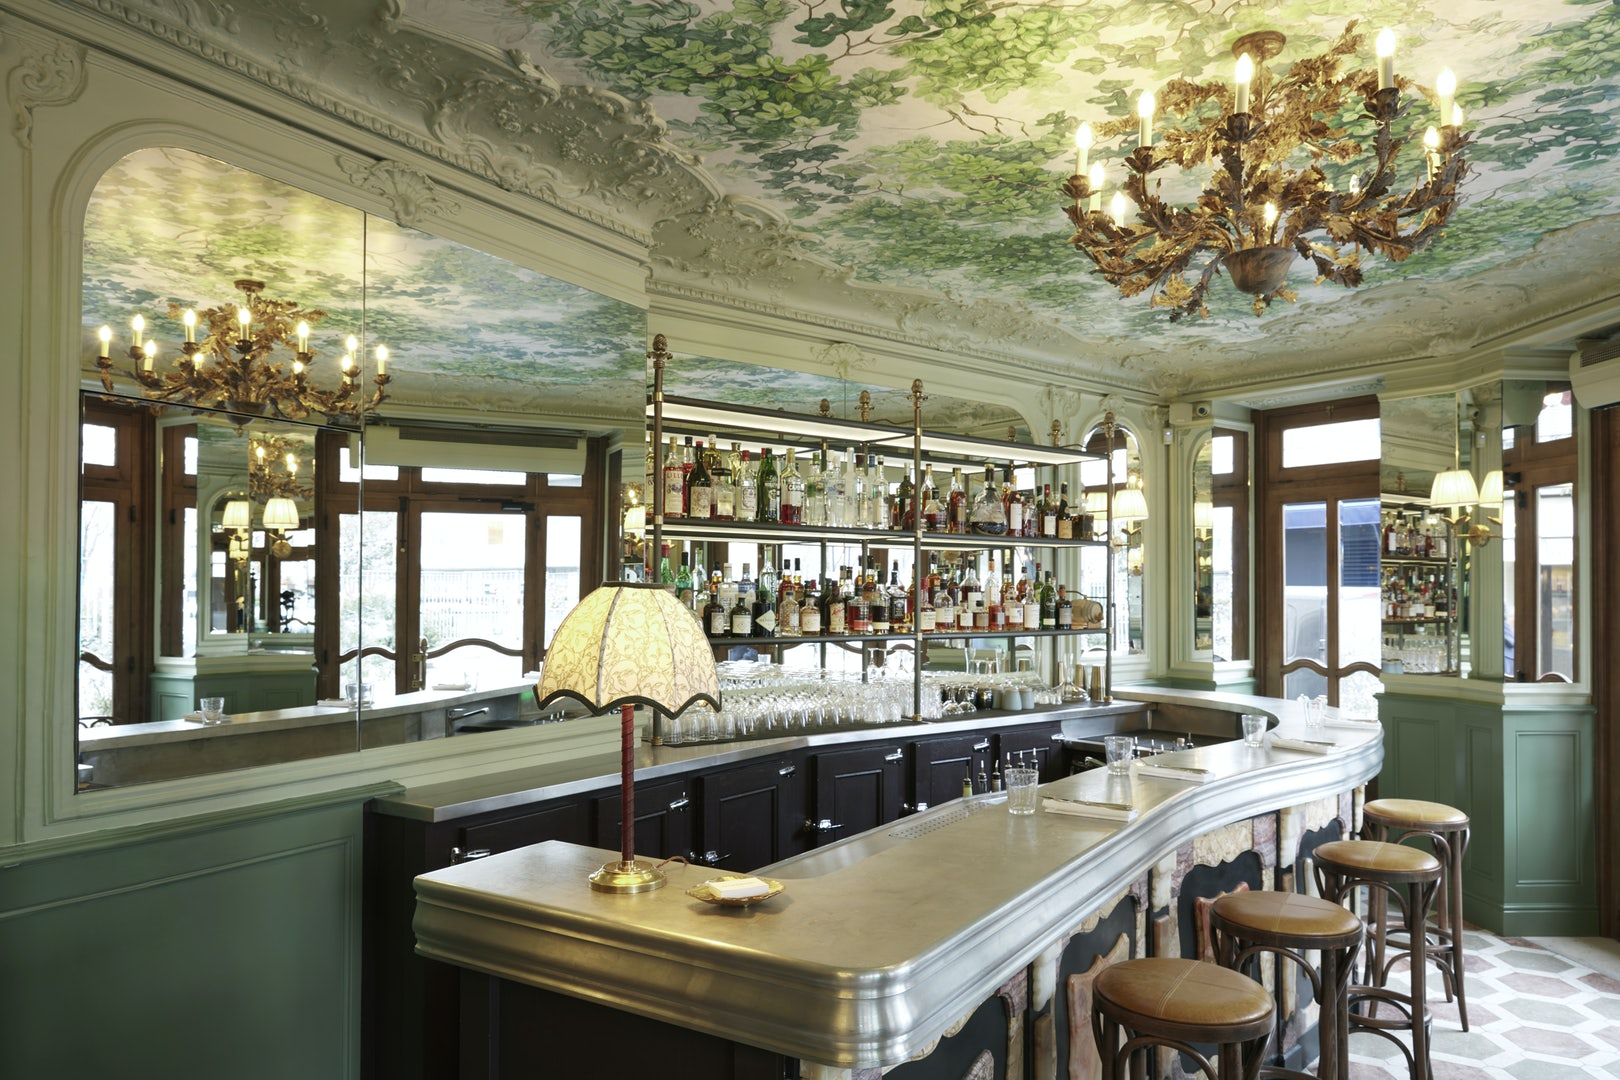 Le Chardenoux brasserie